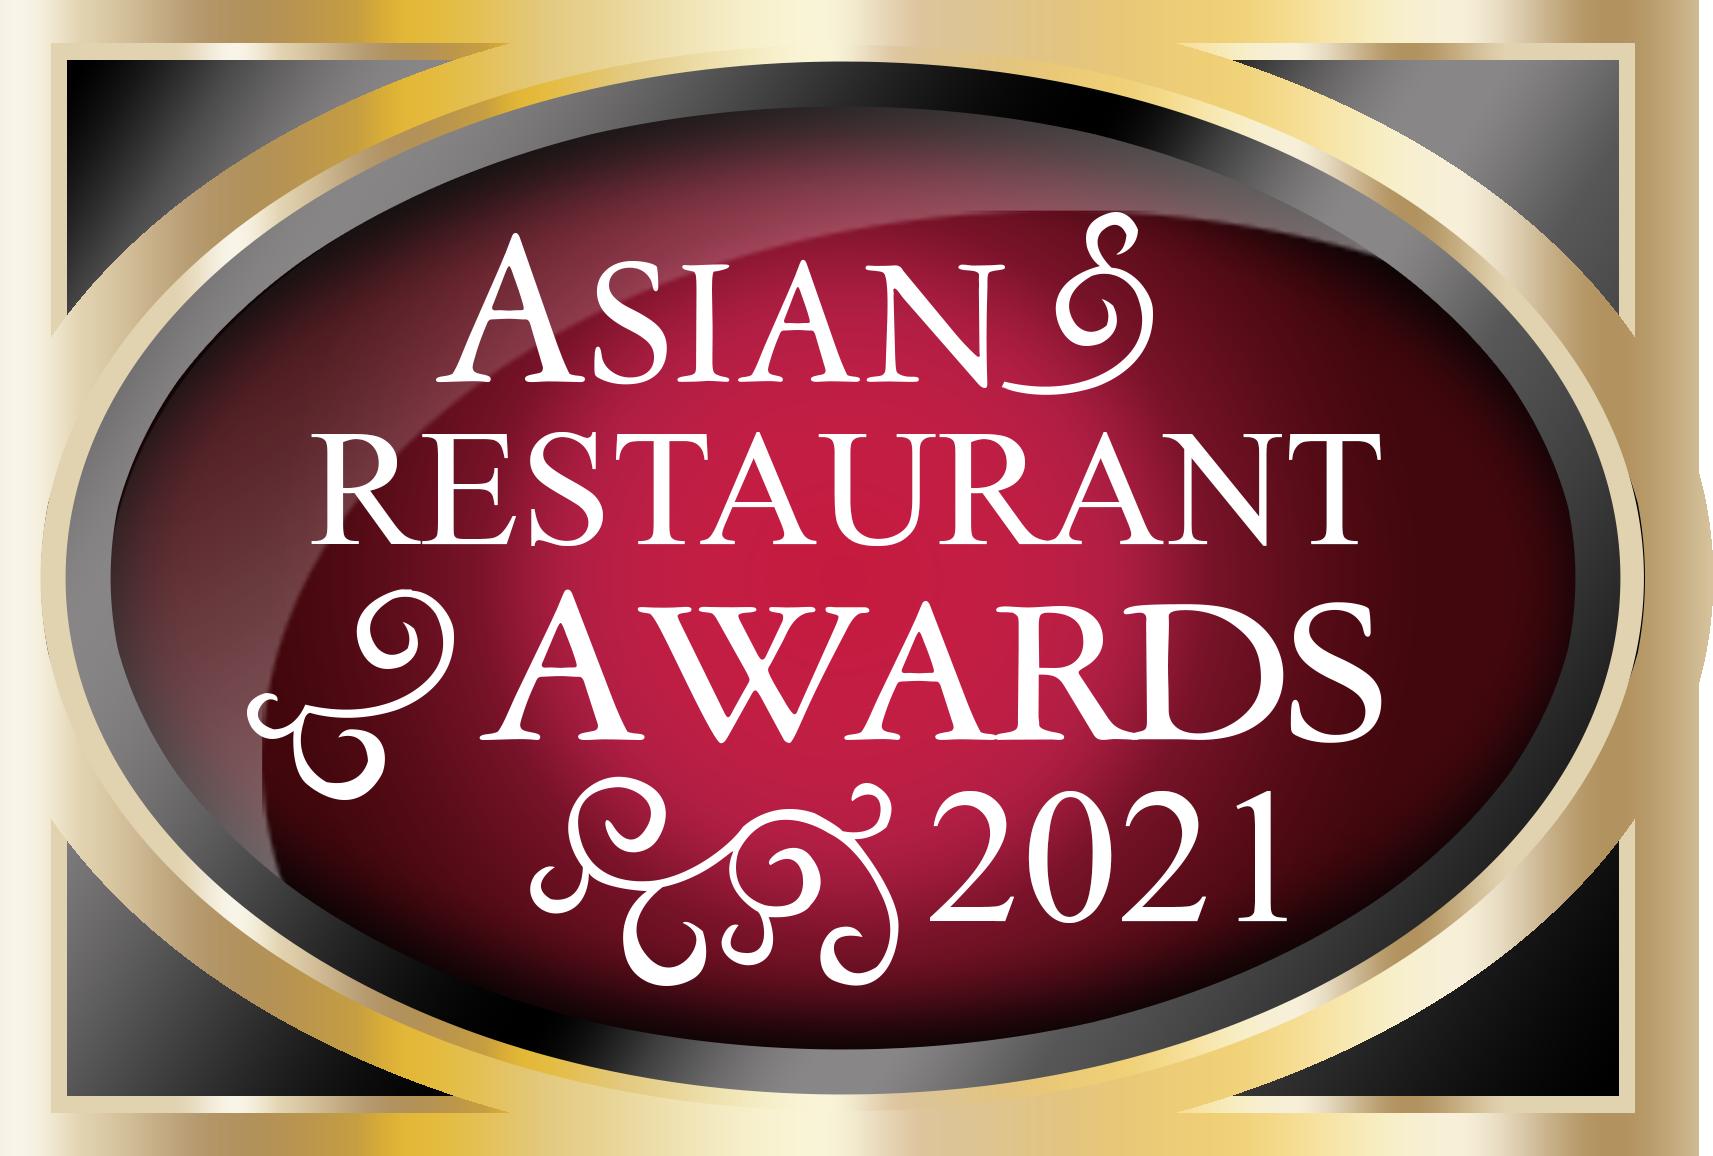 Asian-Restaurant-awards-logo-2021